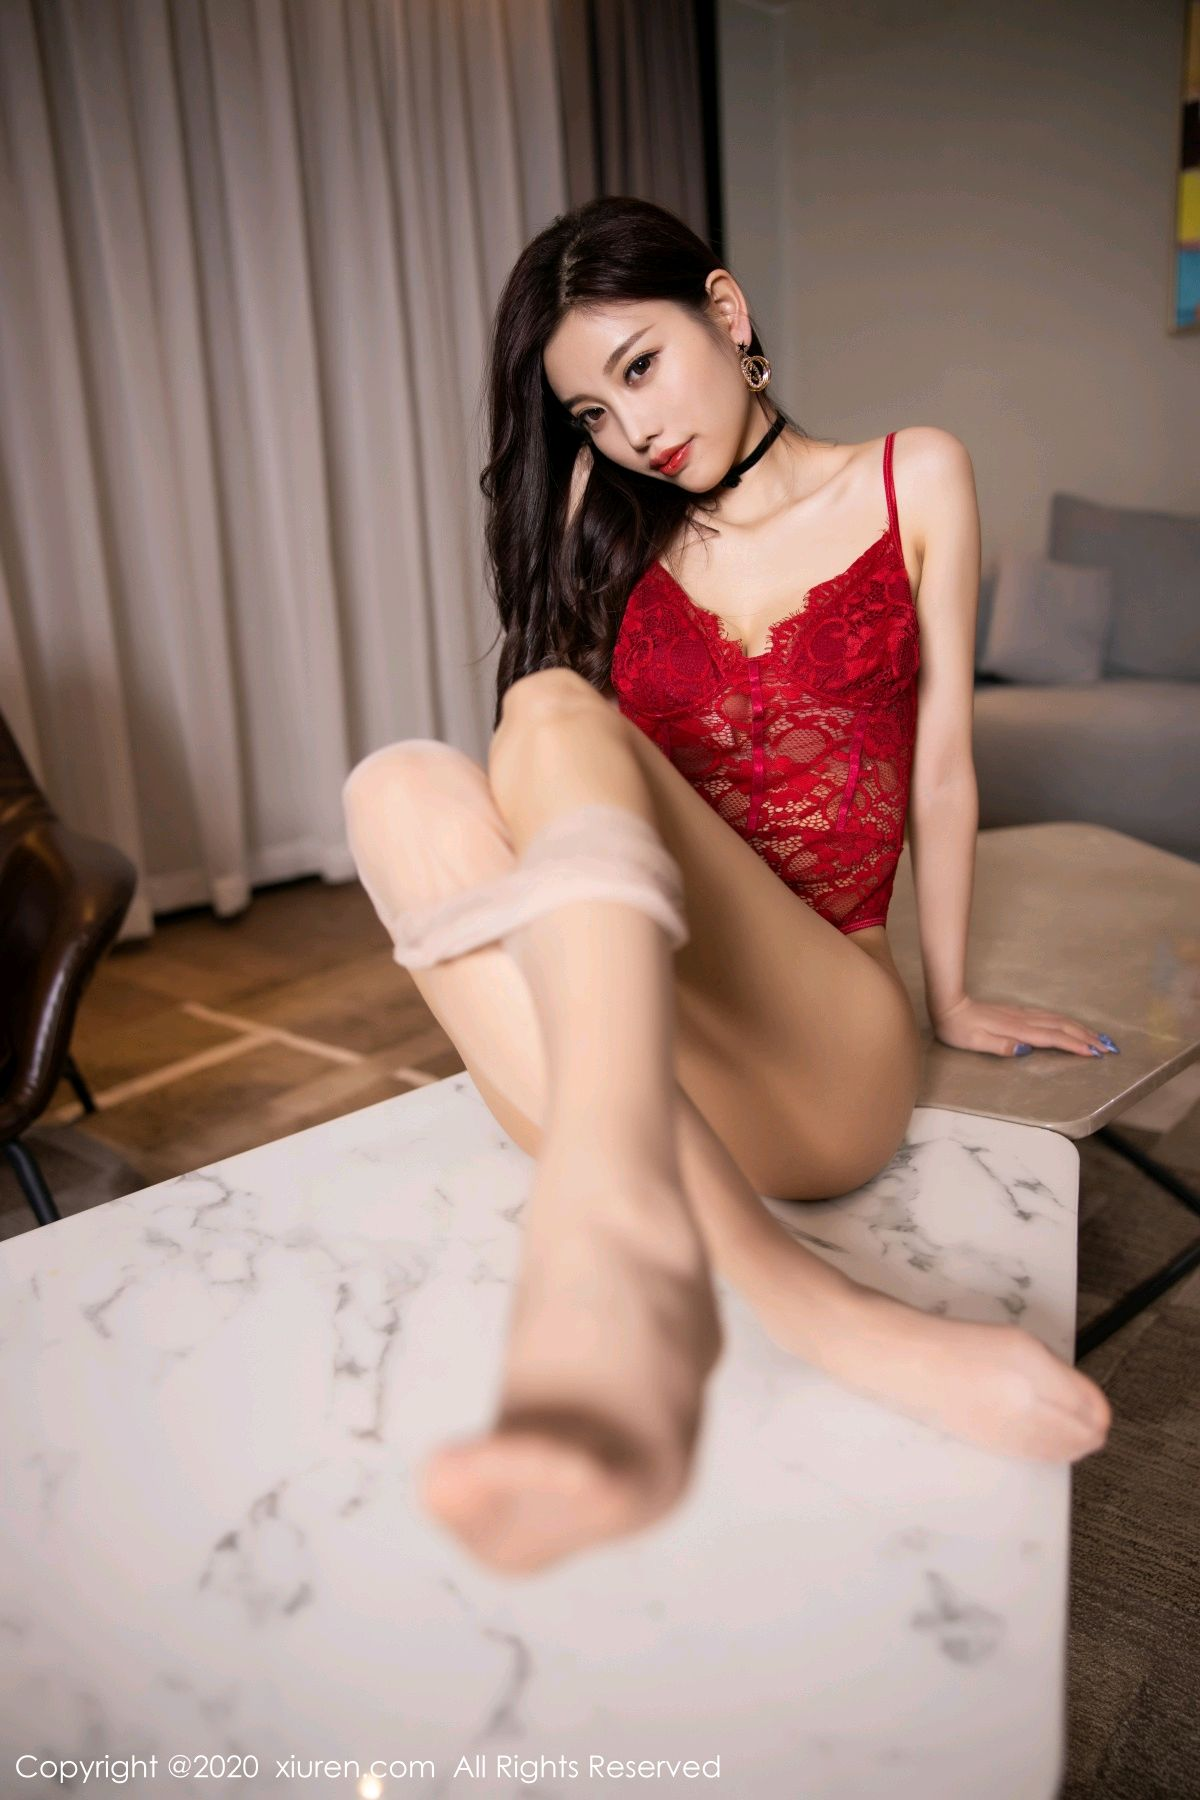 [XiuRen] Vol.2671 Yang Chen Chen 76P, Underwear, Xiuren, Yang Chen Chen